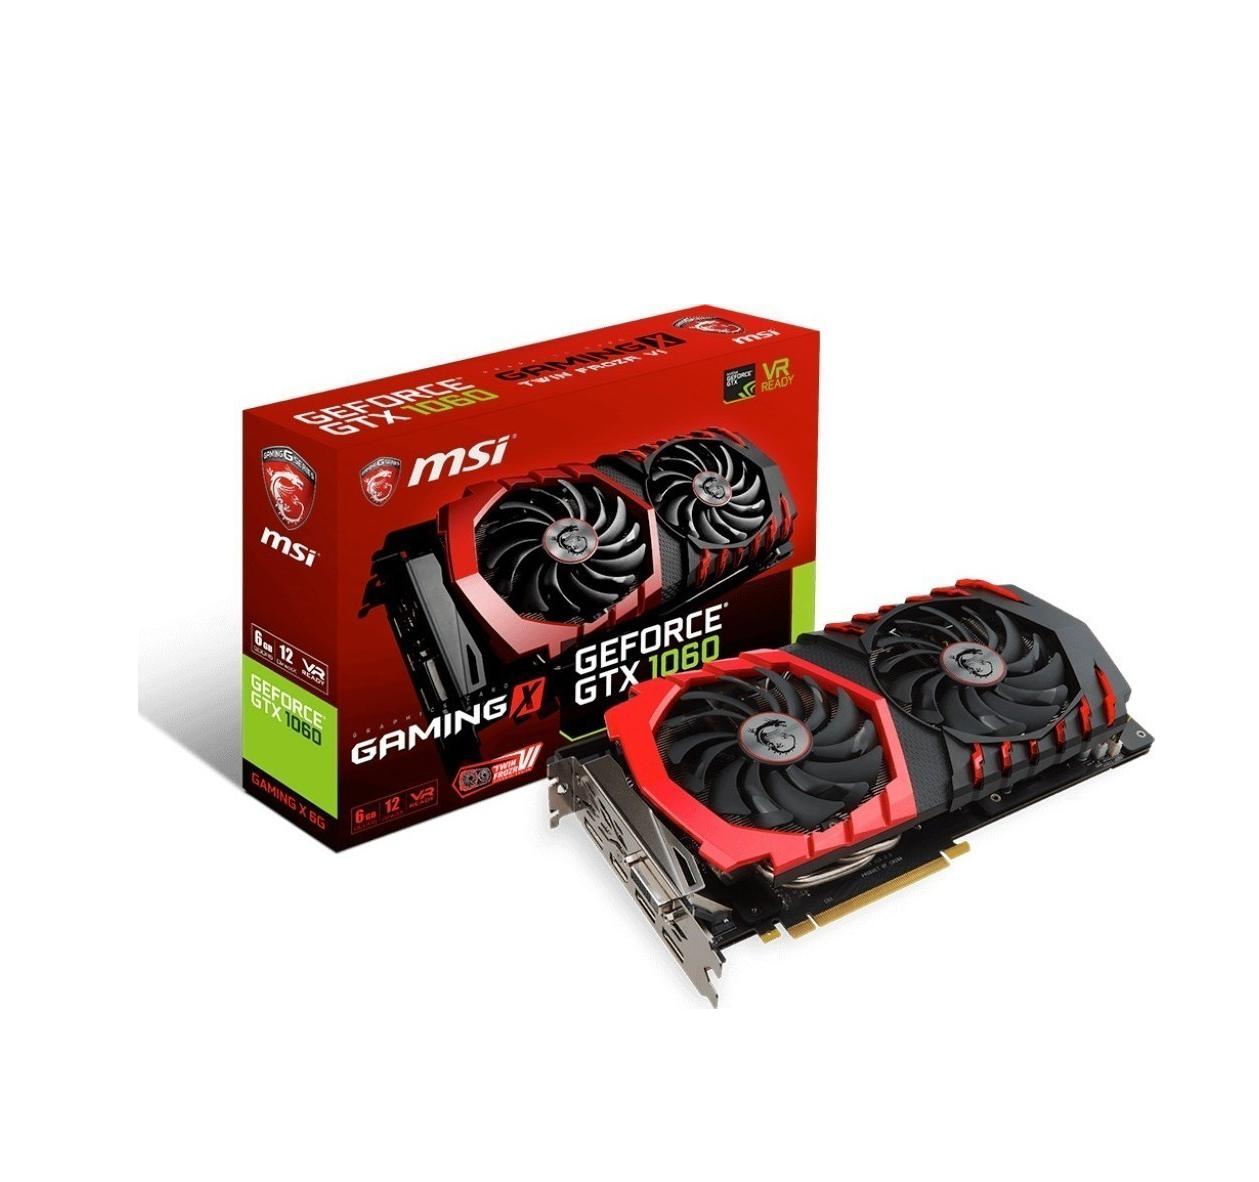 MSI GeForce GTX1060 6GB Gaming X Κάρτα Γραφικών Πληρωμή έως 24 δόσεις